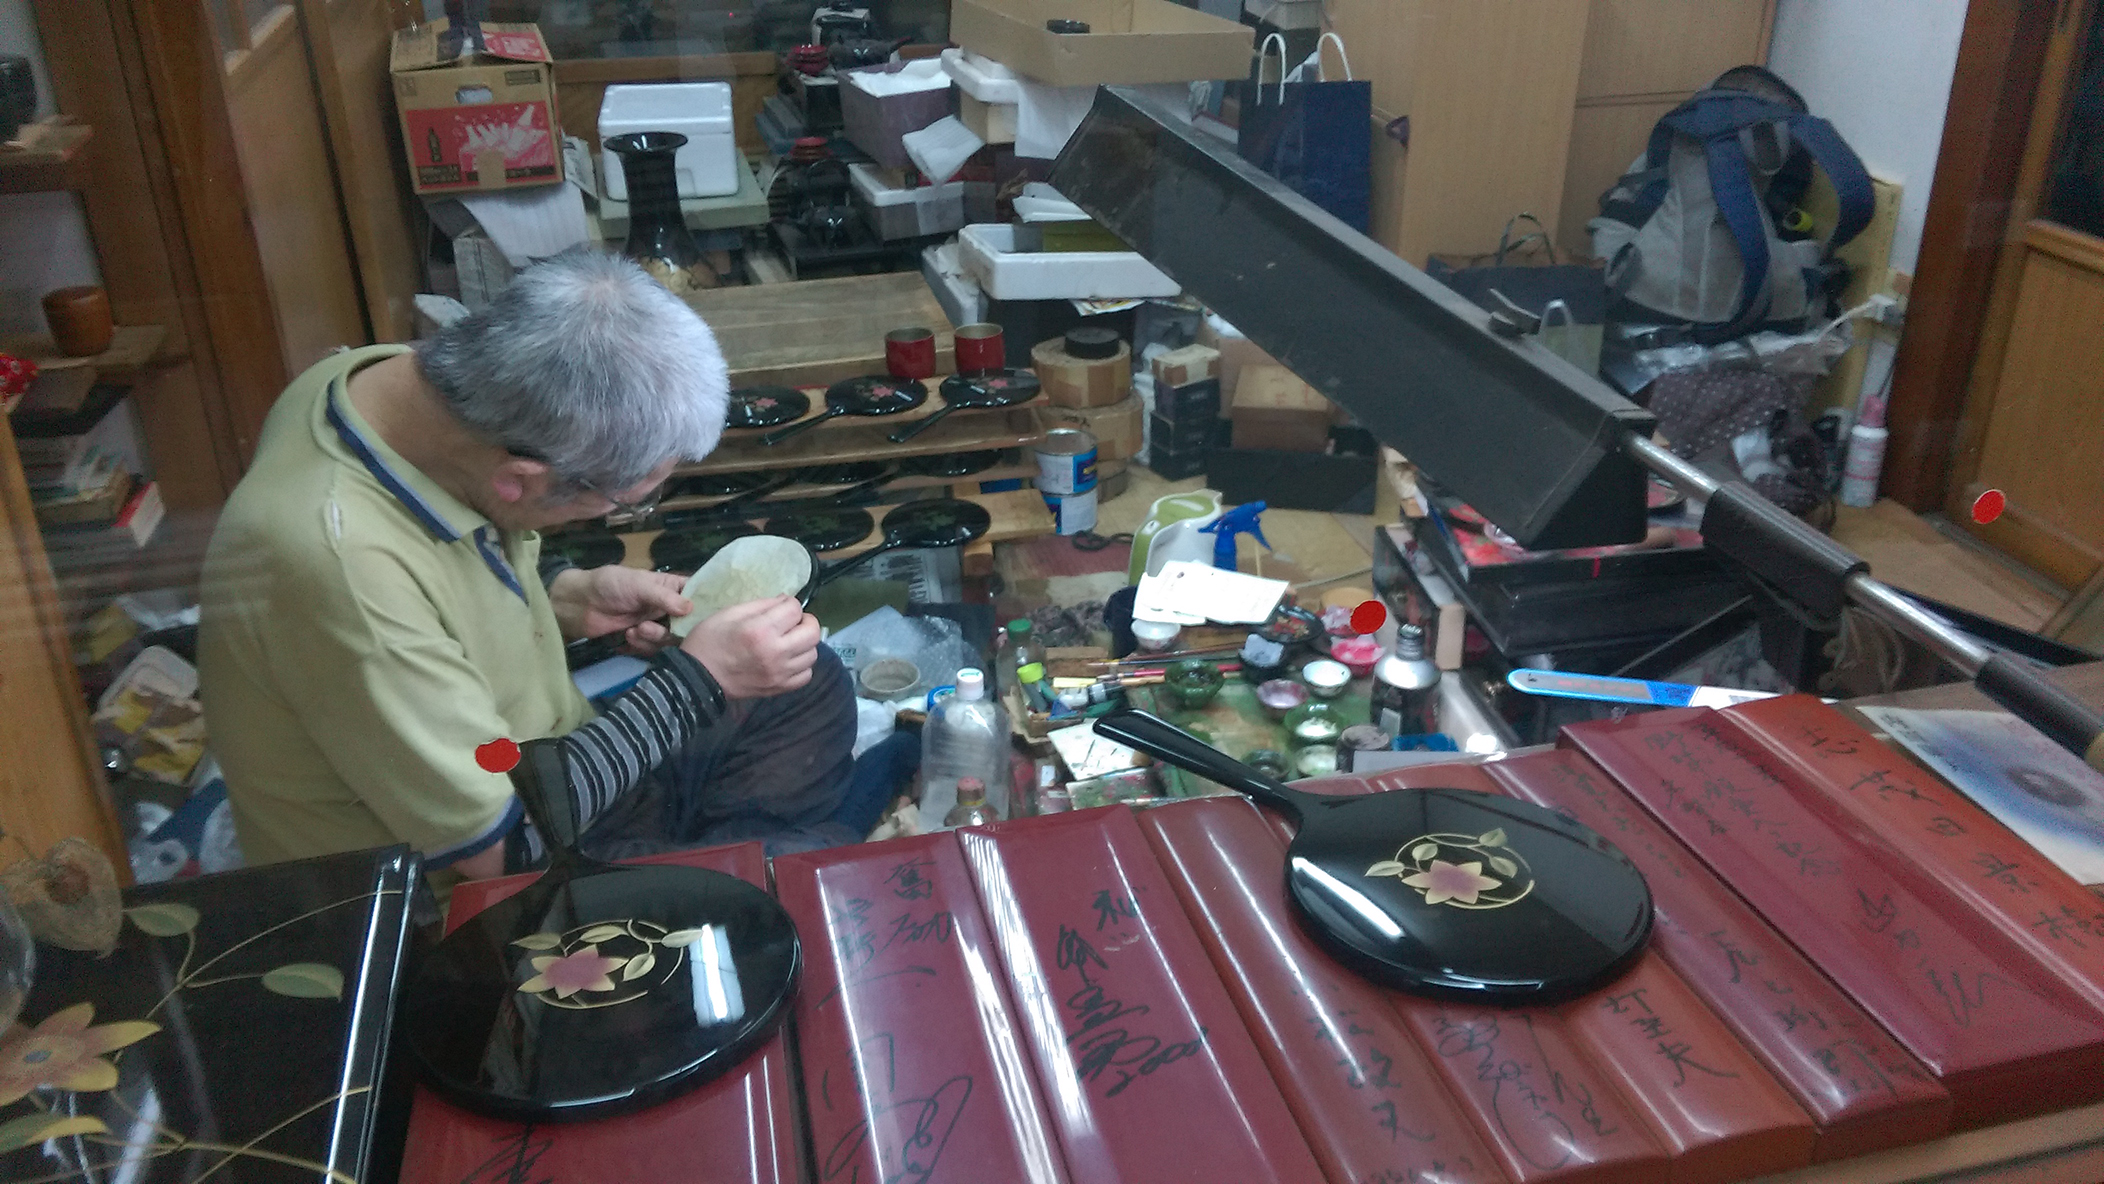 20160619【Workshop reports】漆器工房鈴武さんにて会津蒔絵の体験と工房の見学をして参りました!